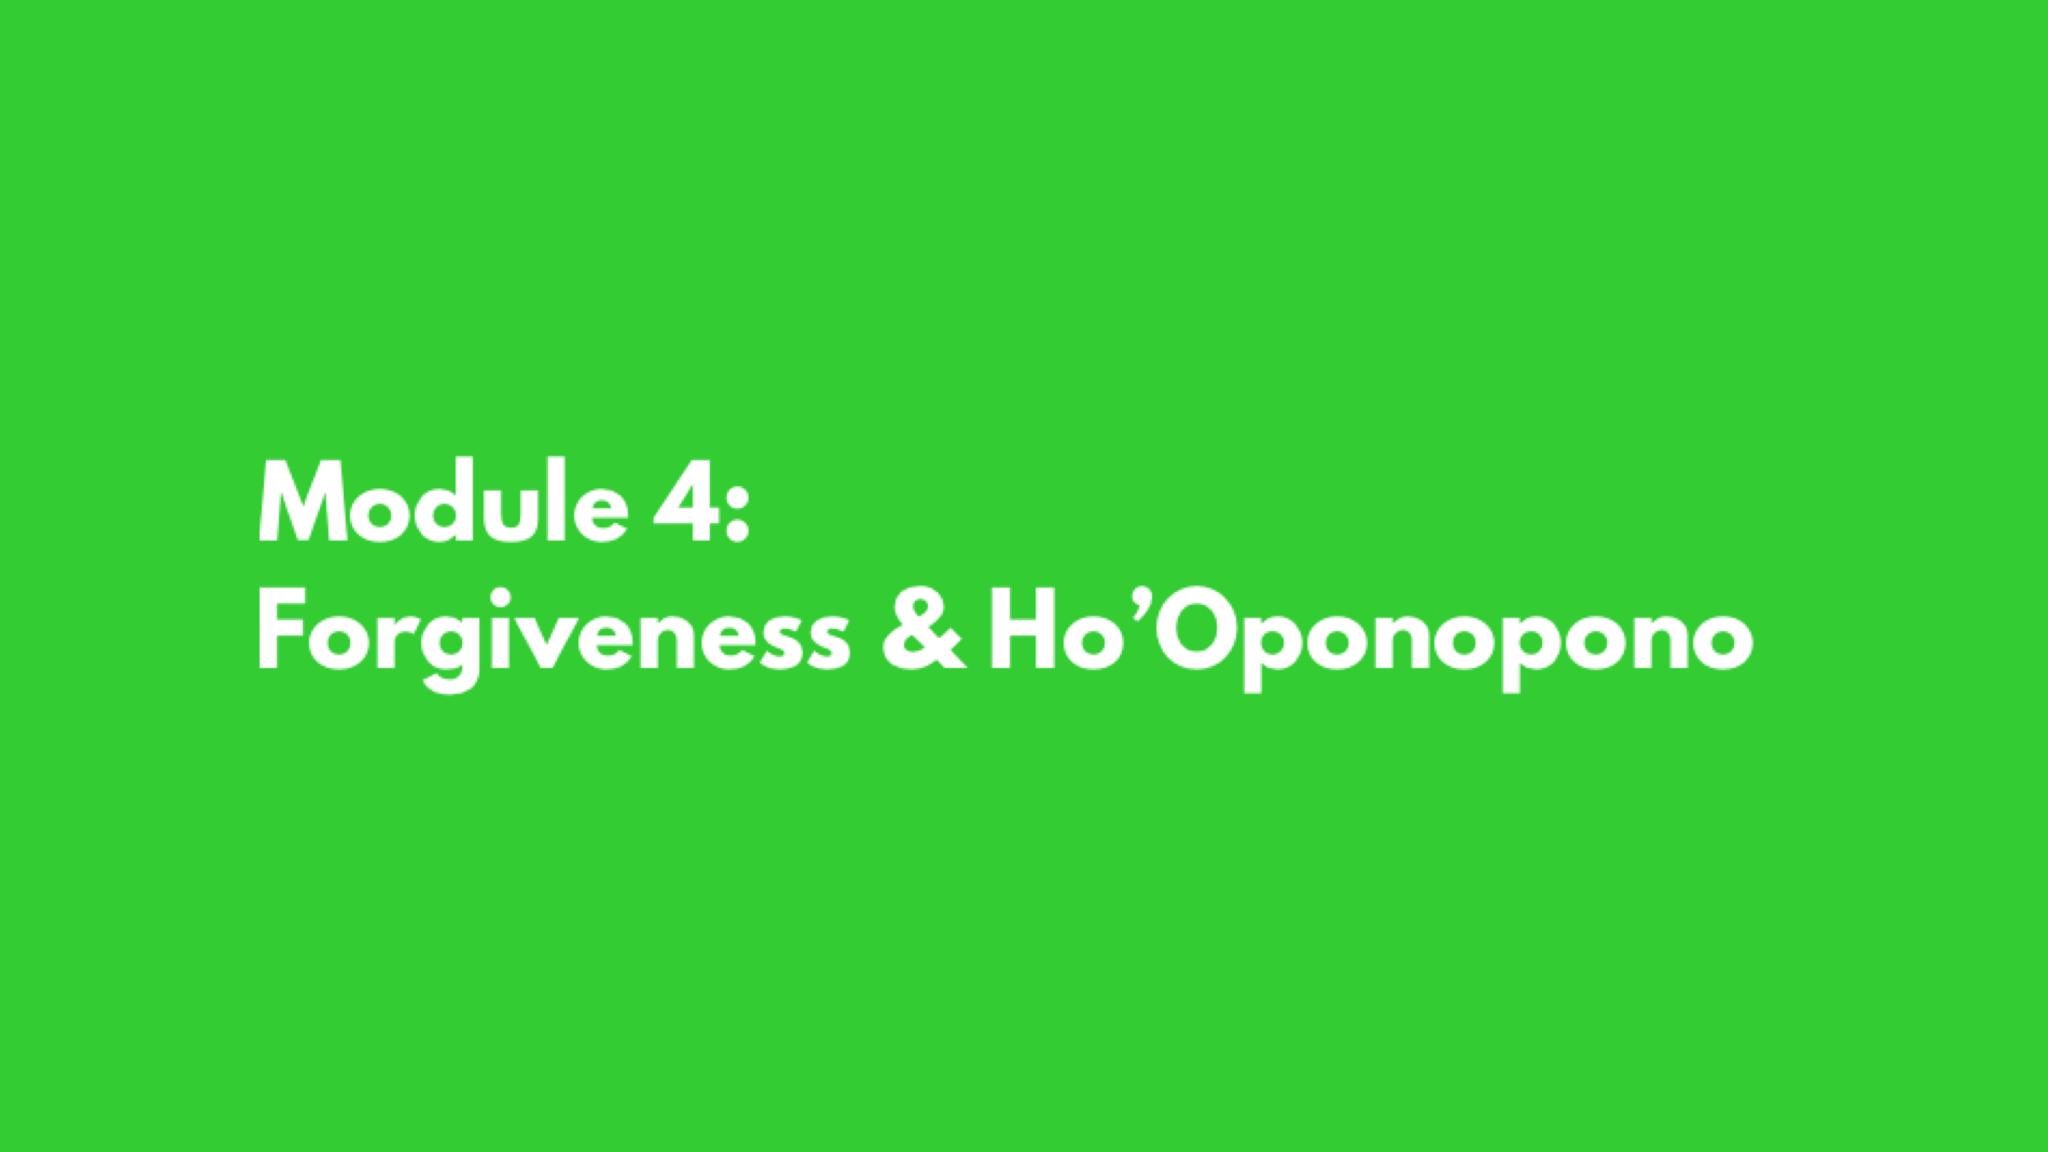 Module 4: Forgiveness & Ho'Oponopono